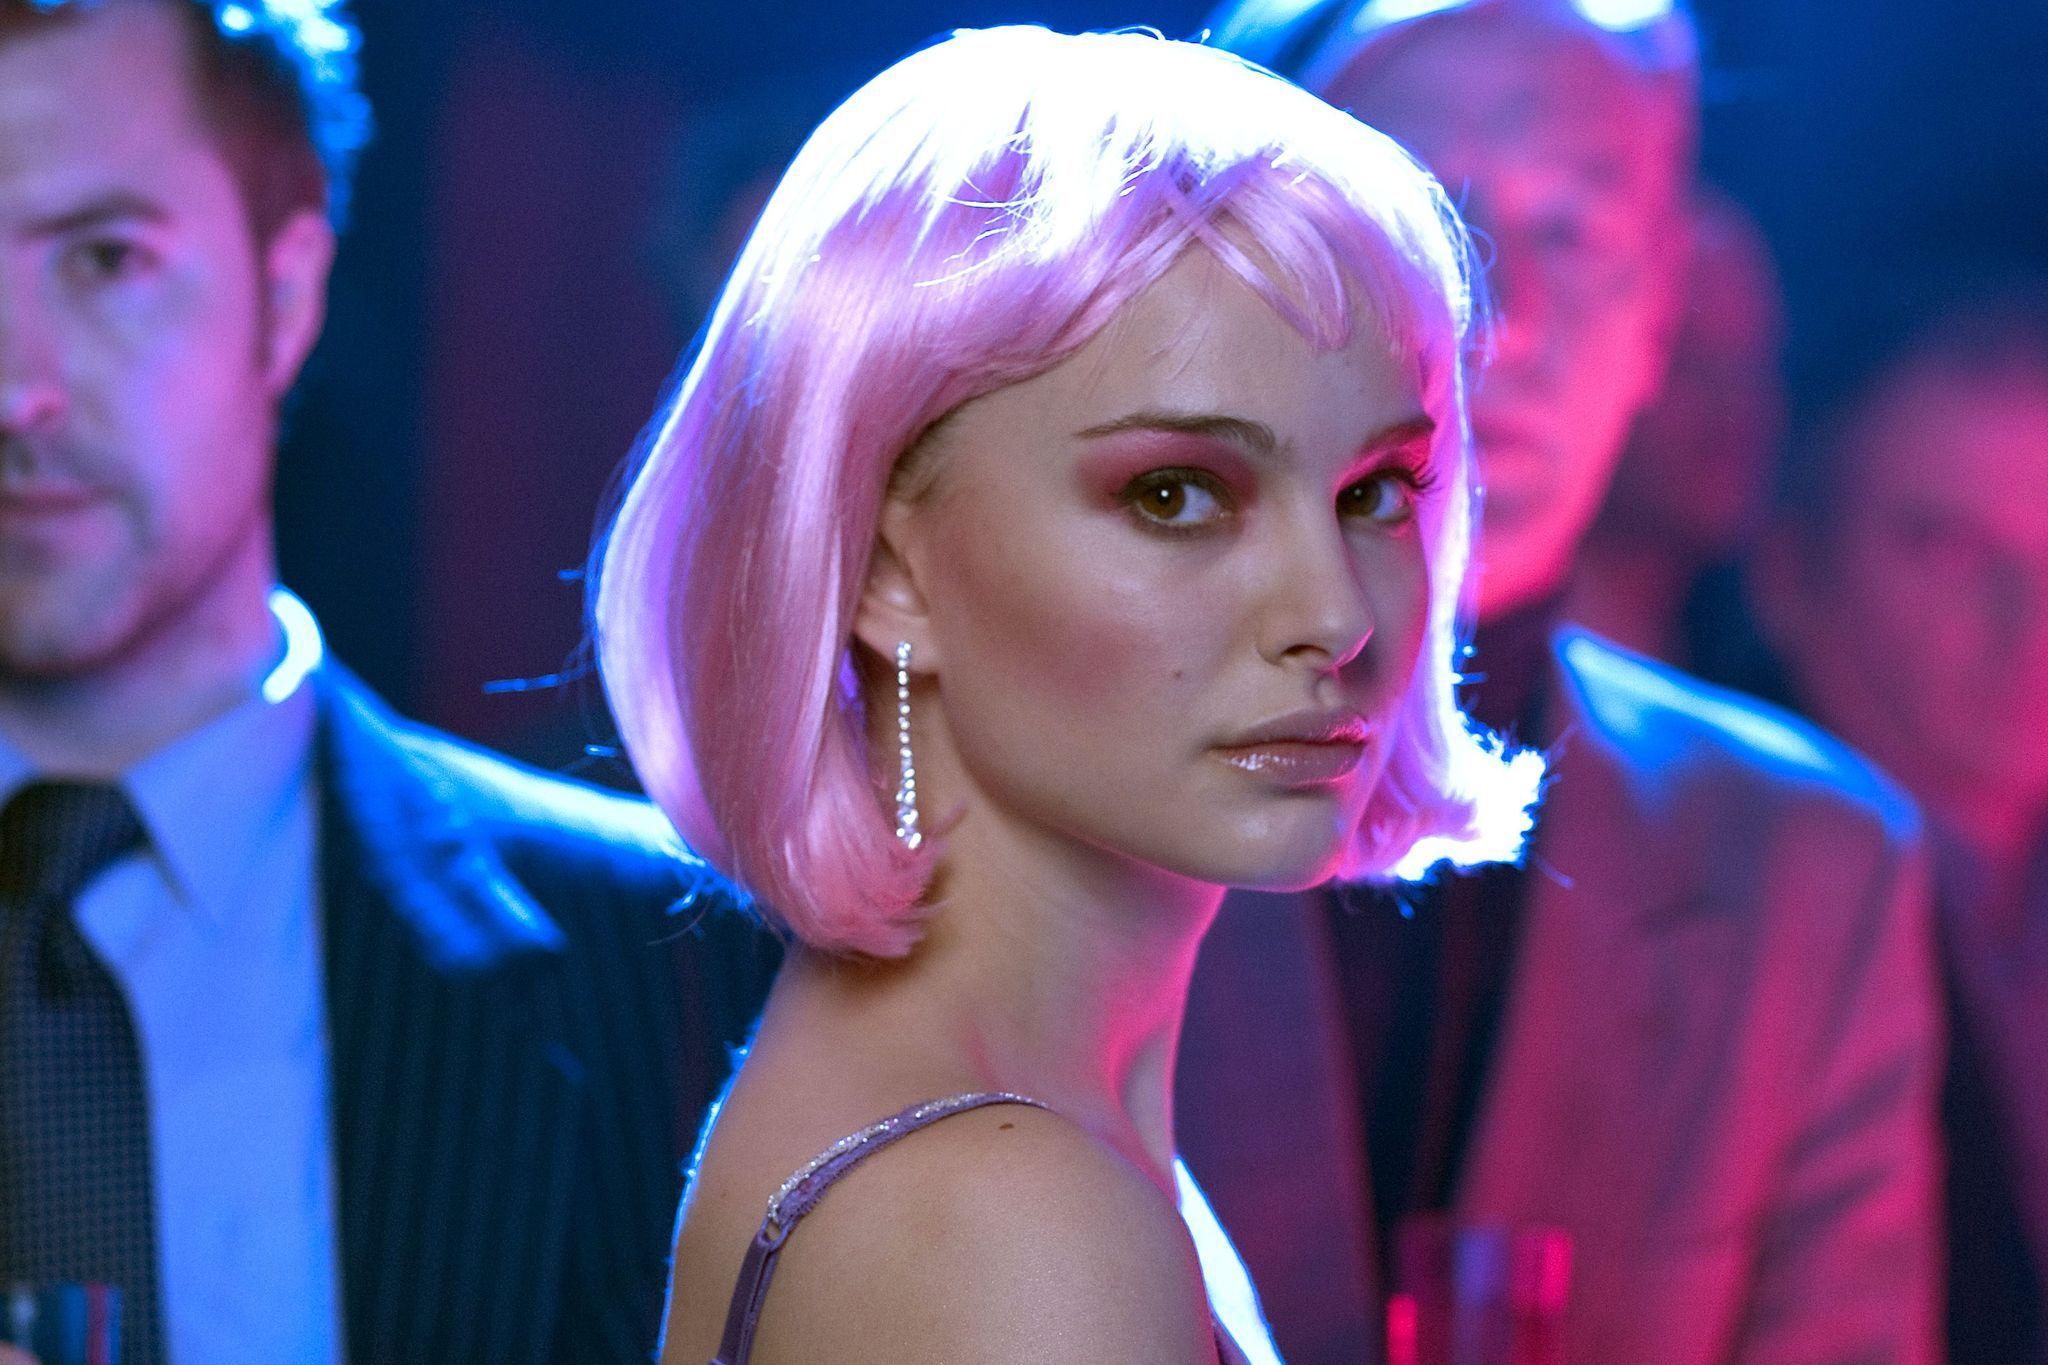 Natalie Portman closer